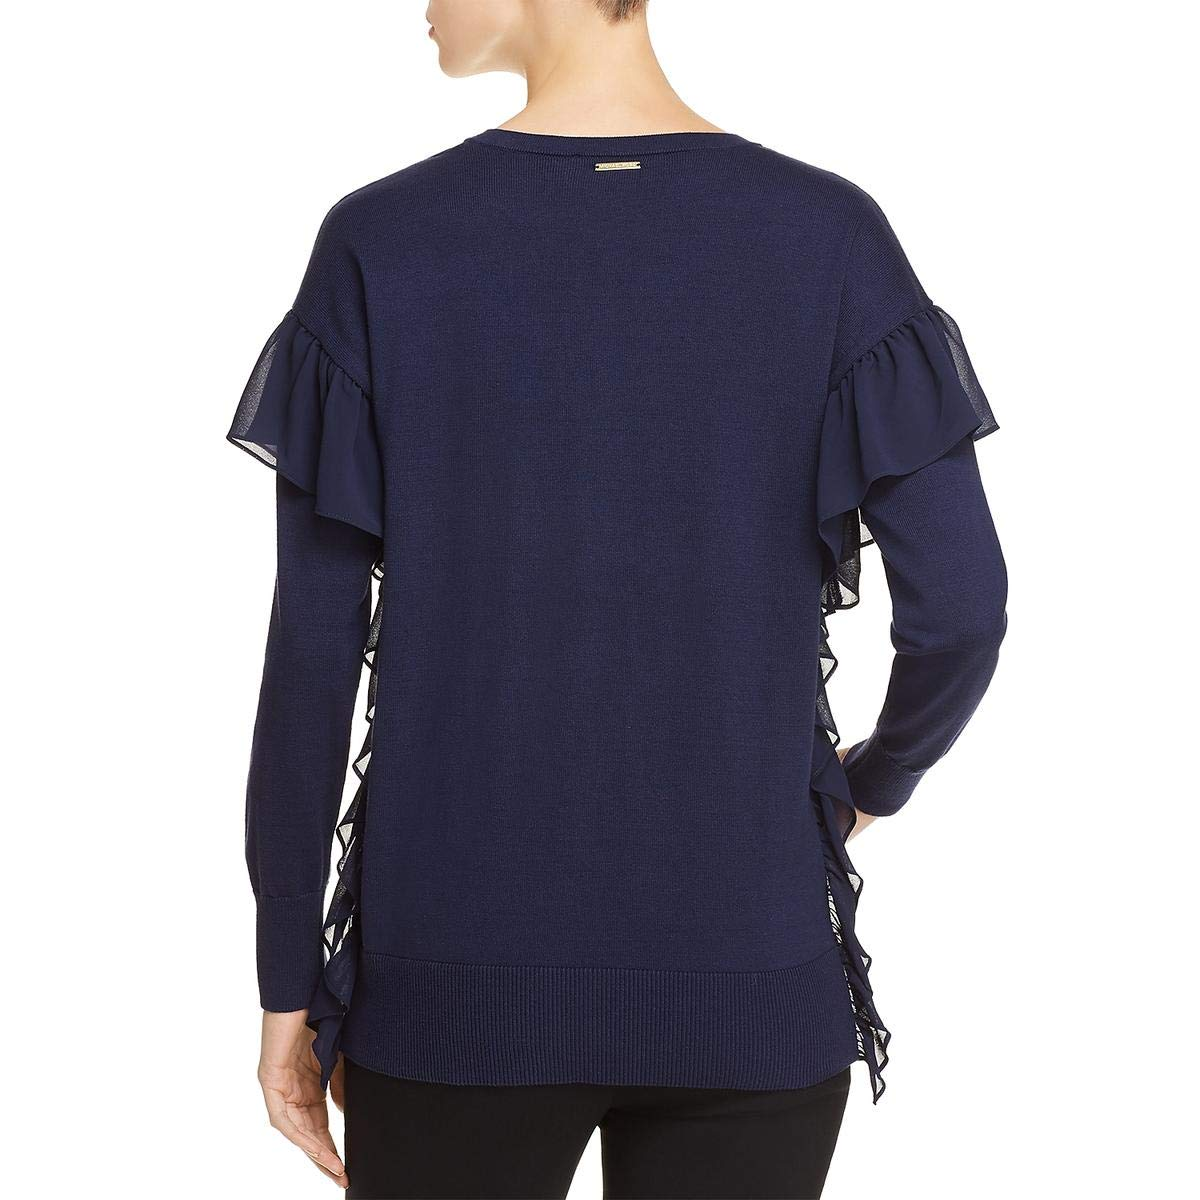 88e9e3c3529 Amazon.com  Michael Kors Womens Ruffled Ribbed Trim V-Neck Sweater  Clothing